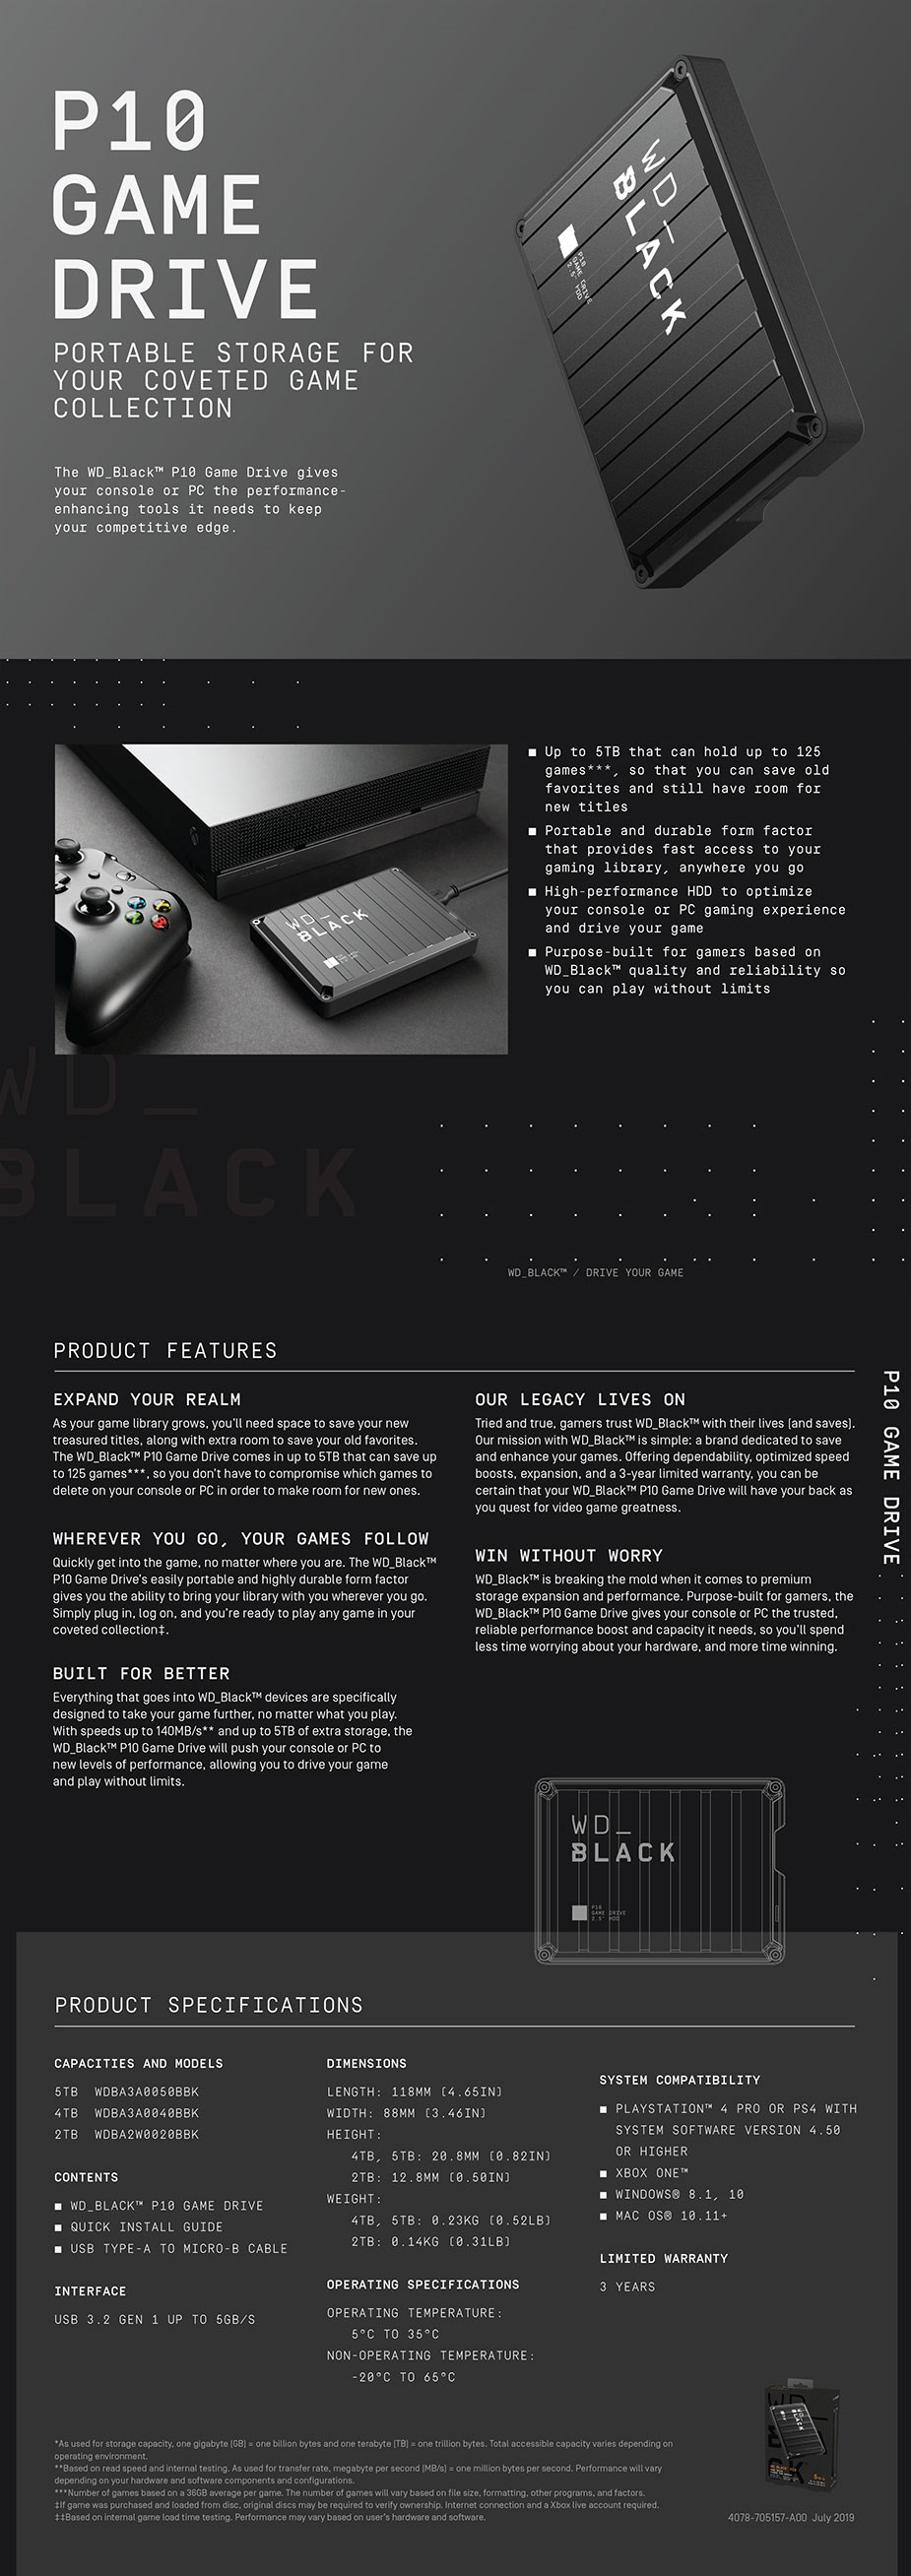 wd-black-2tb-p10-game-drive-wdba2w0020bbk-ac31469-7.jpg